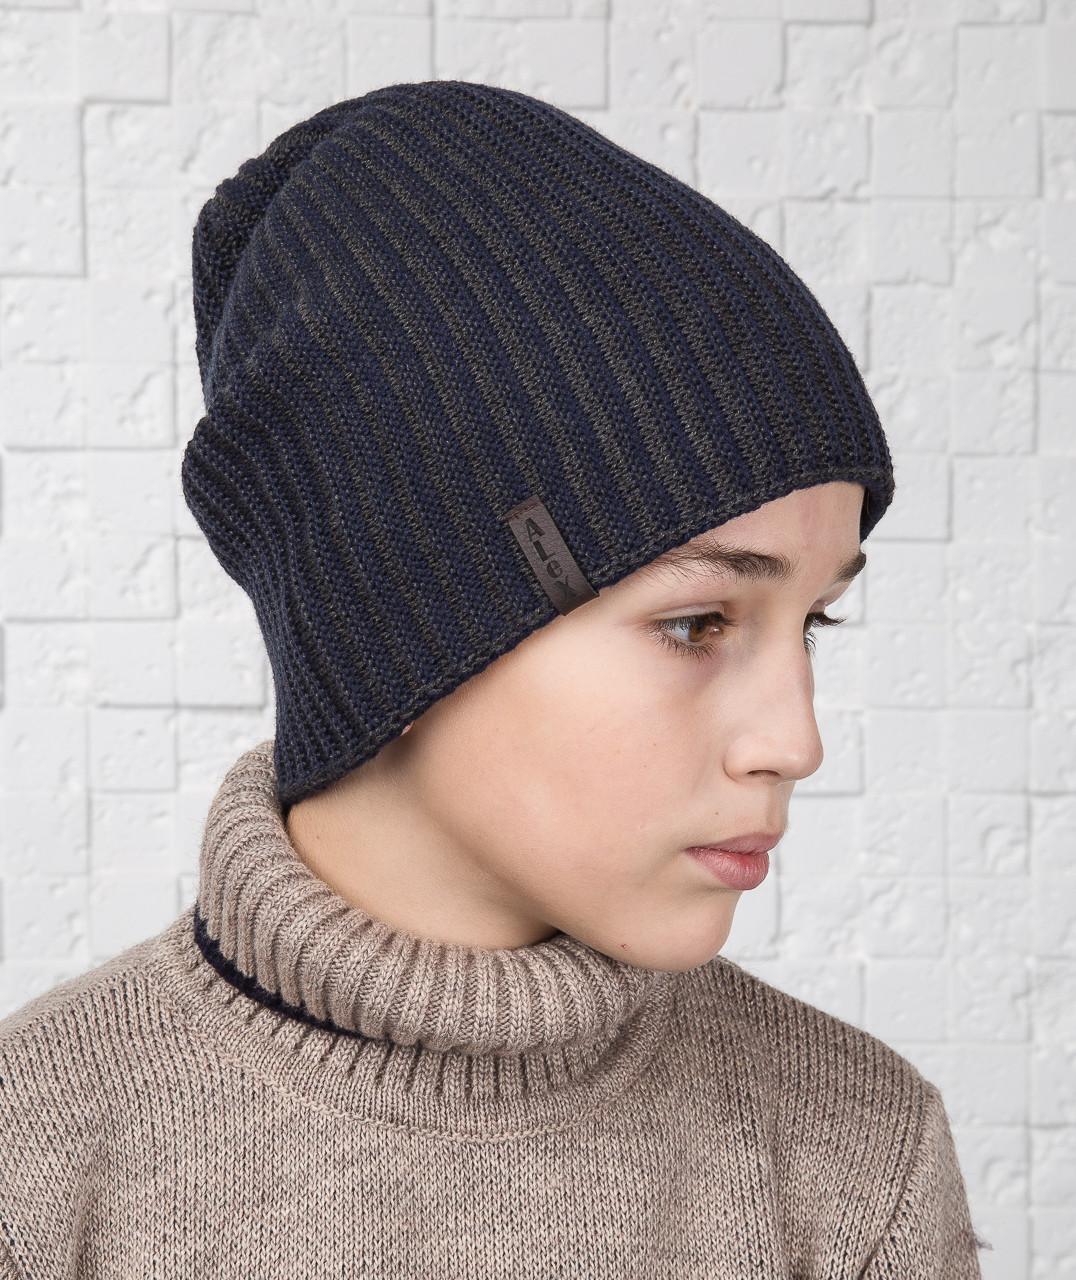 Зимняя вязаная шапка носок для мальчика подростка двухсторонняя на флисе - Артикул AL1035